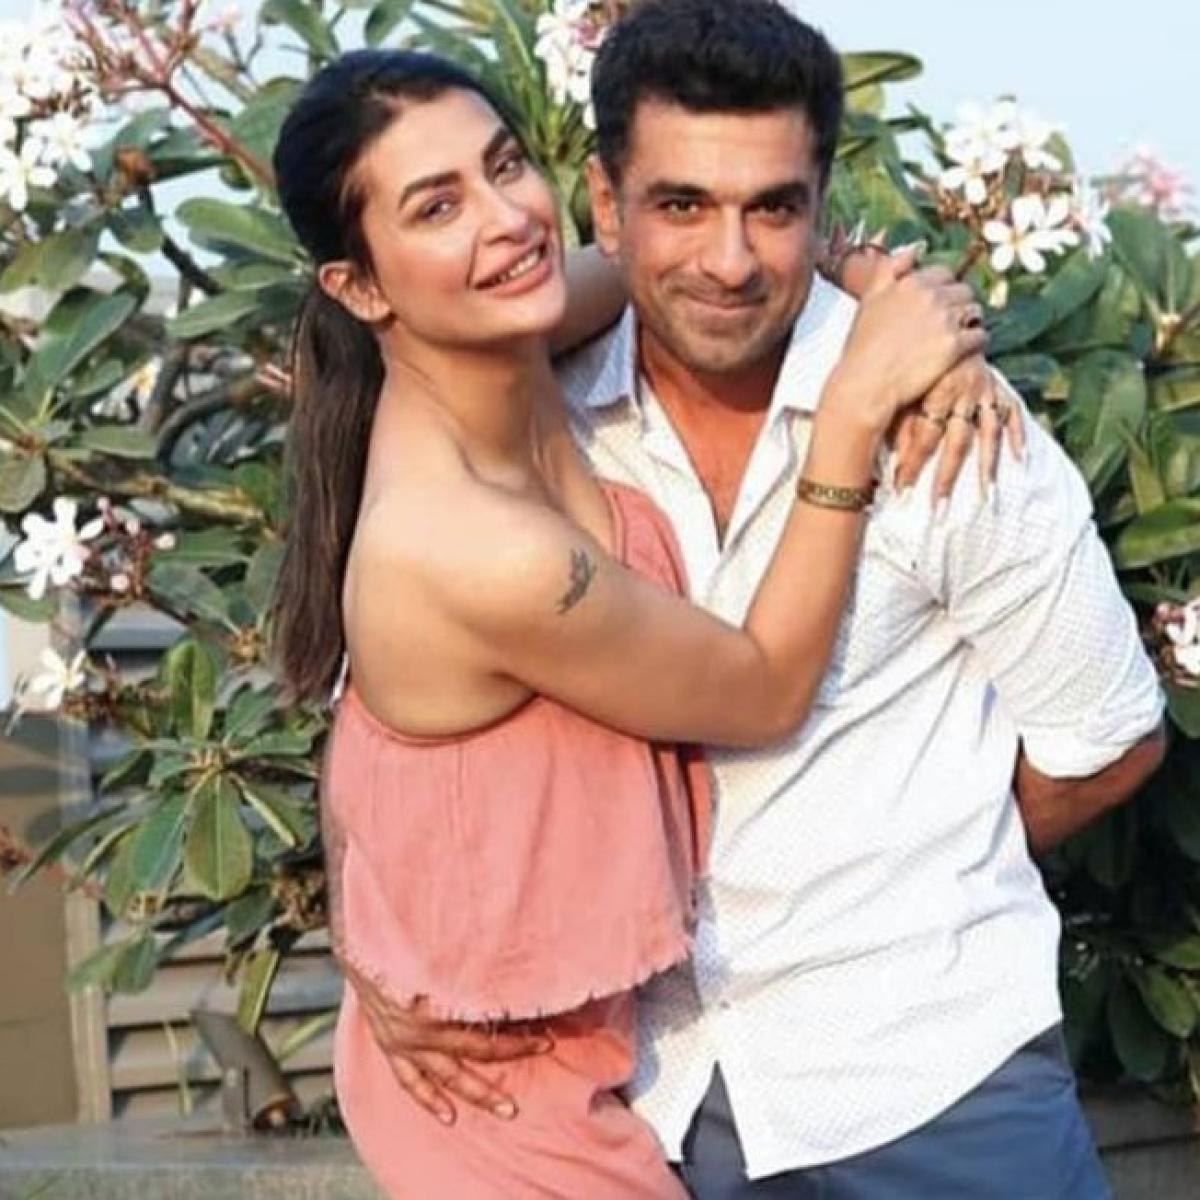 'Bigg Boss 14' couple Eijaz Khan, Pavitra Punia make relationship official on Instagram